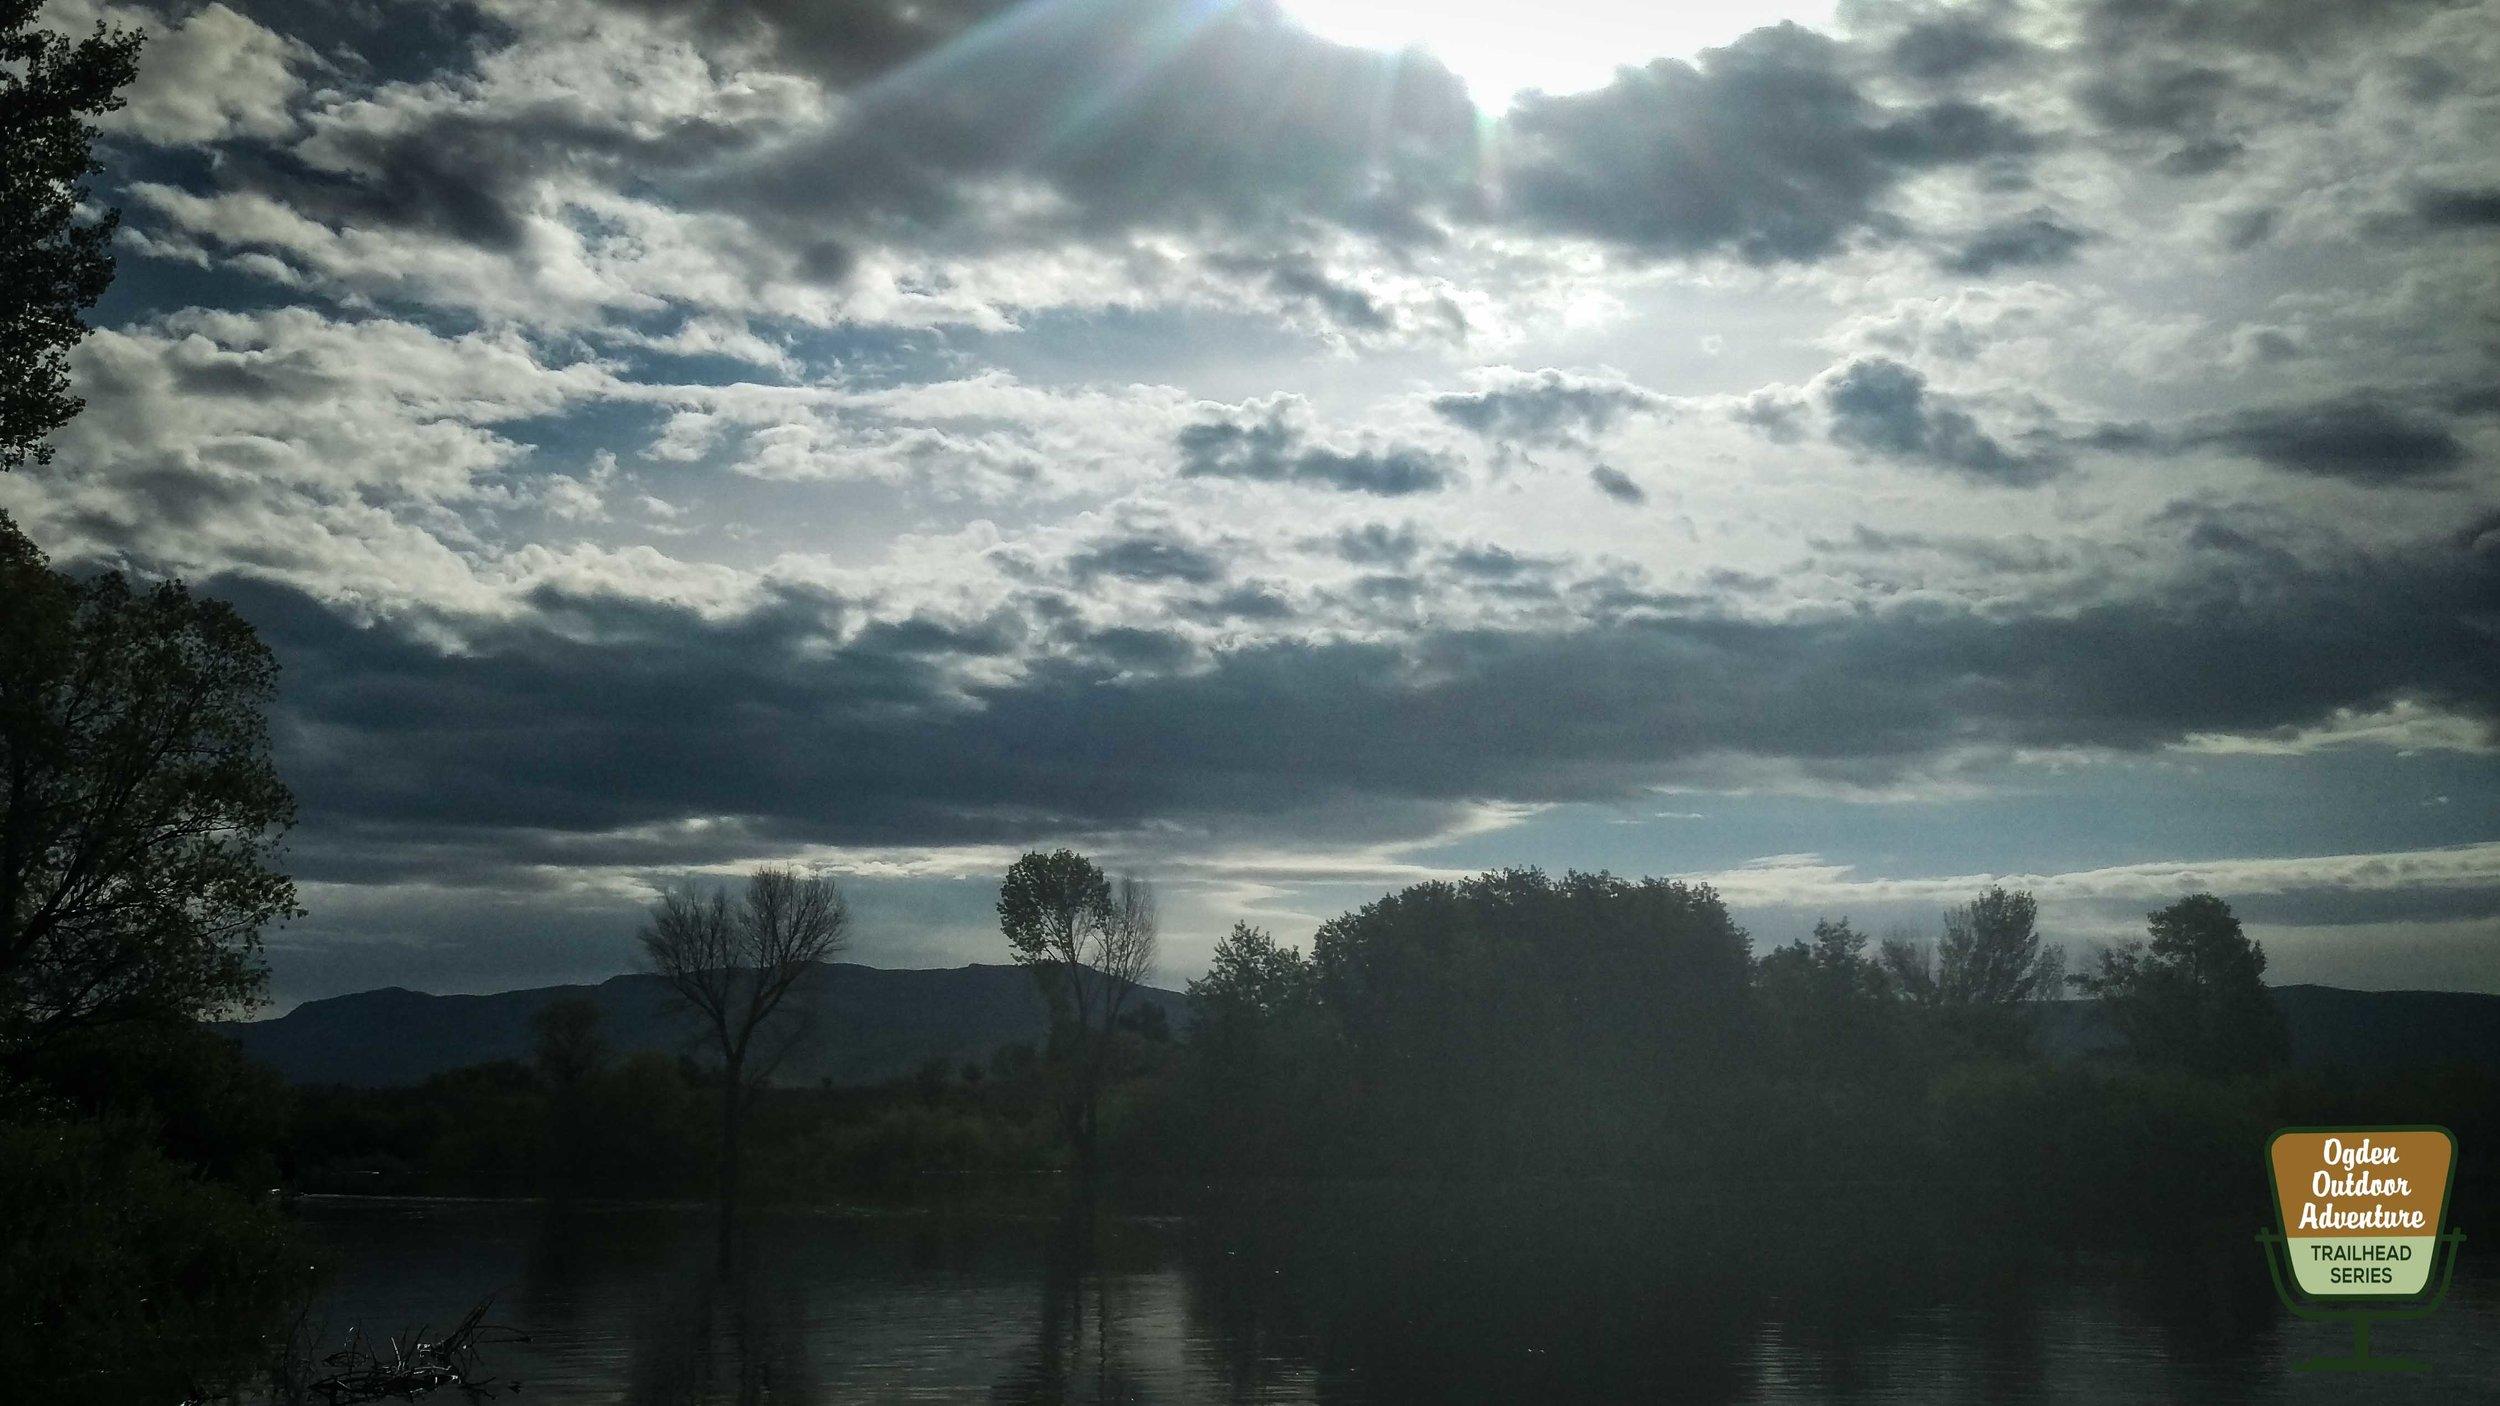 Ogden Outdoor Adventure Show 274 Muddy Rivers Telemark-2.jpg